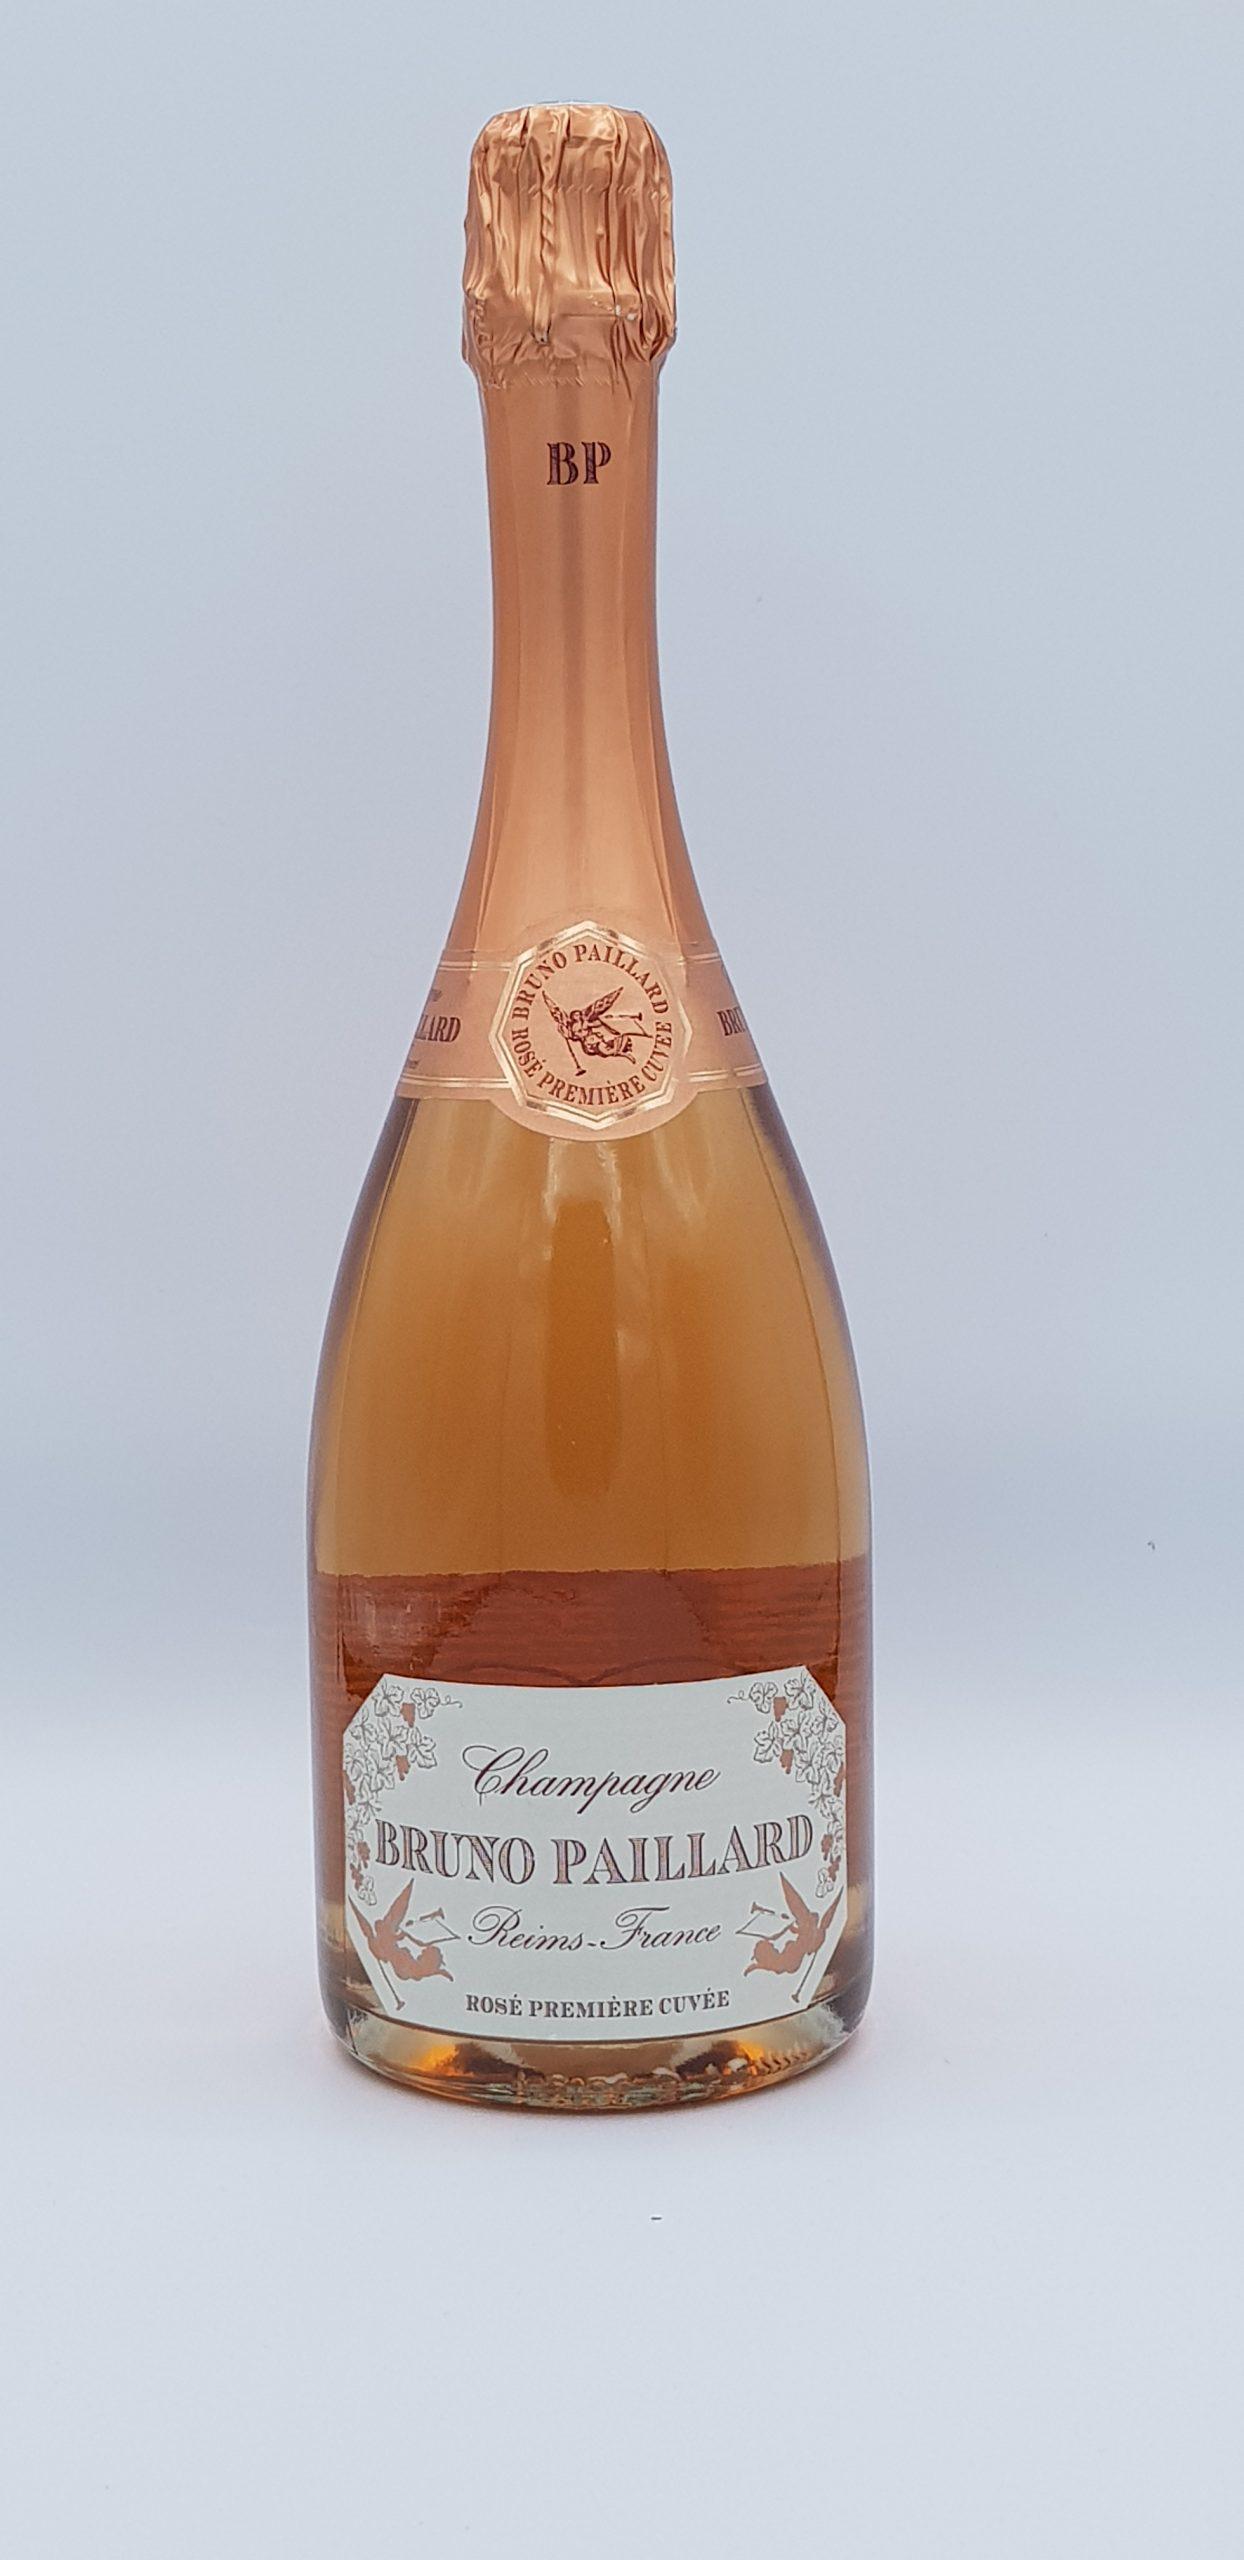 Champagne B Paillard 1Ere Cuvee Rosee